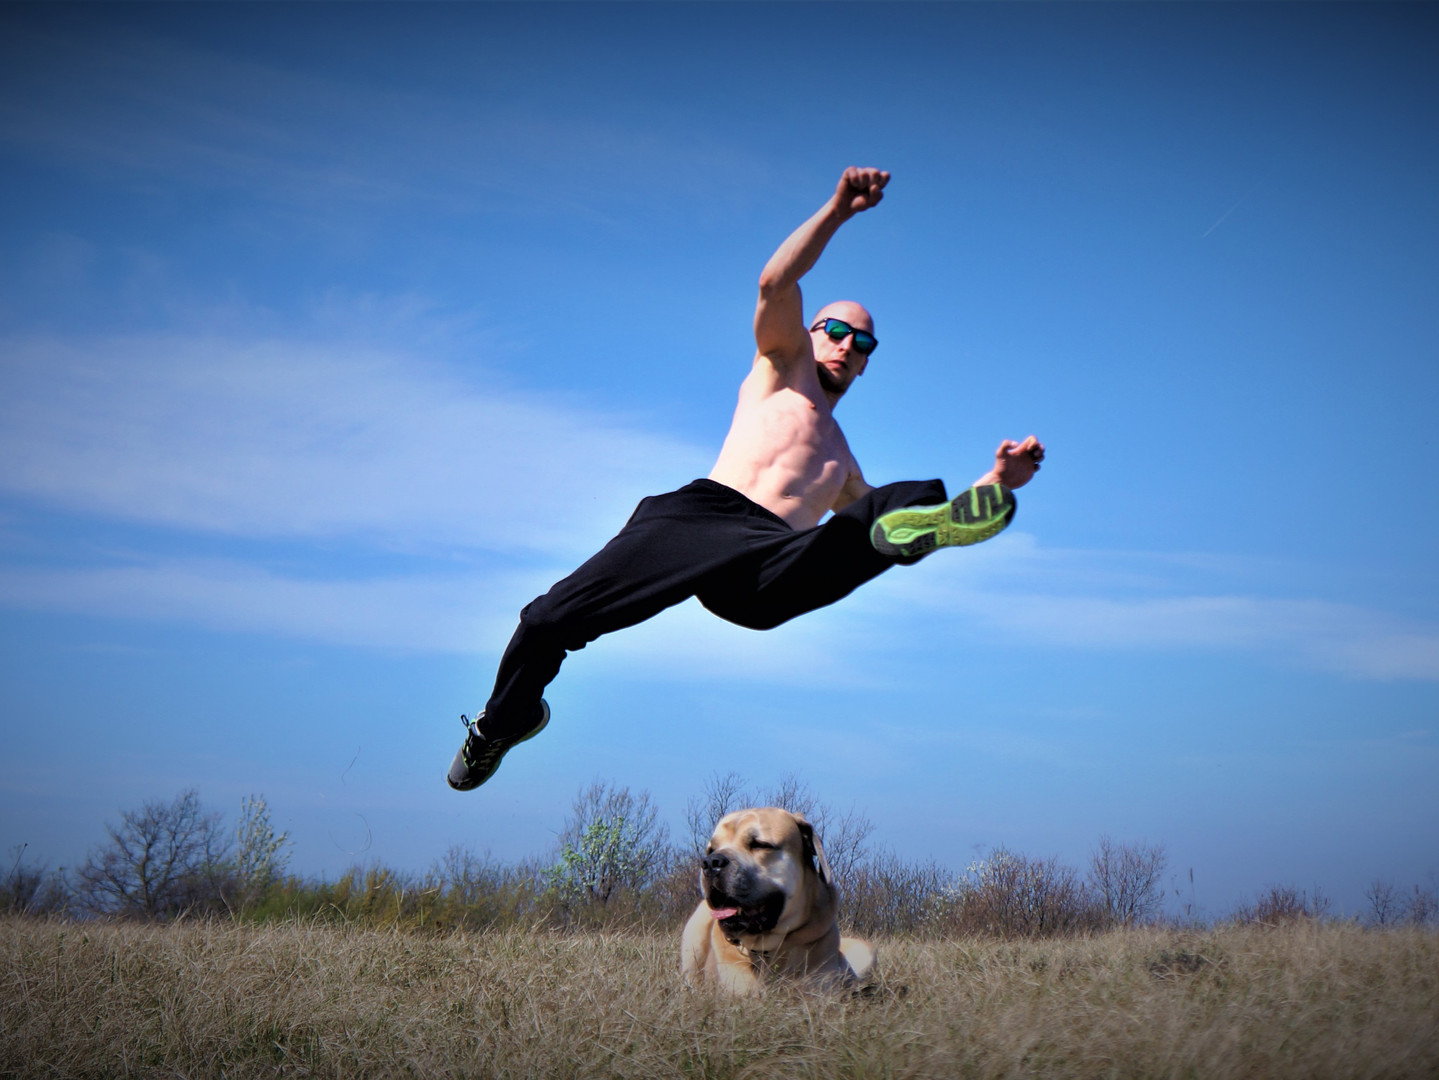 Spinning Jump Kick